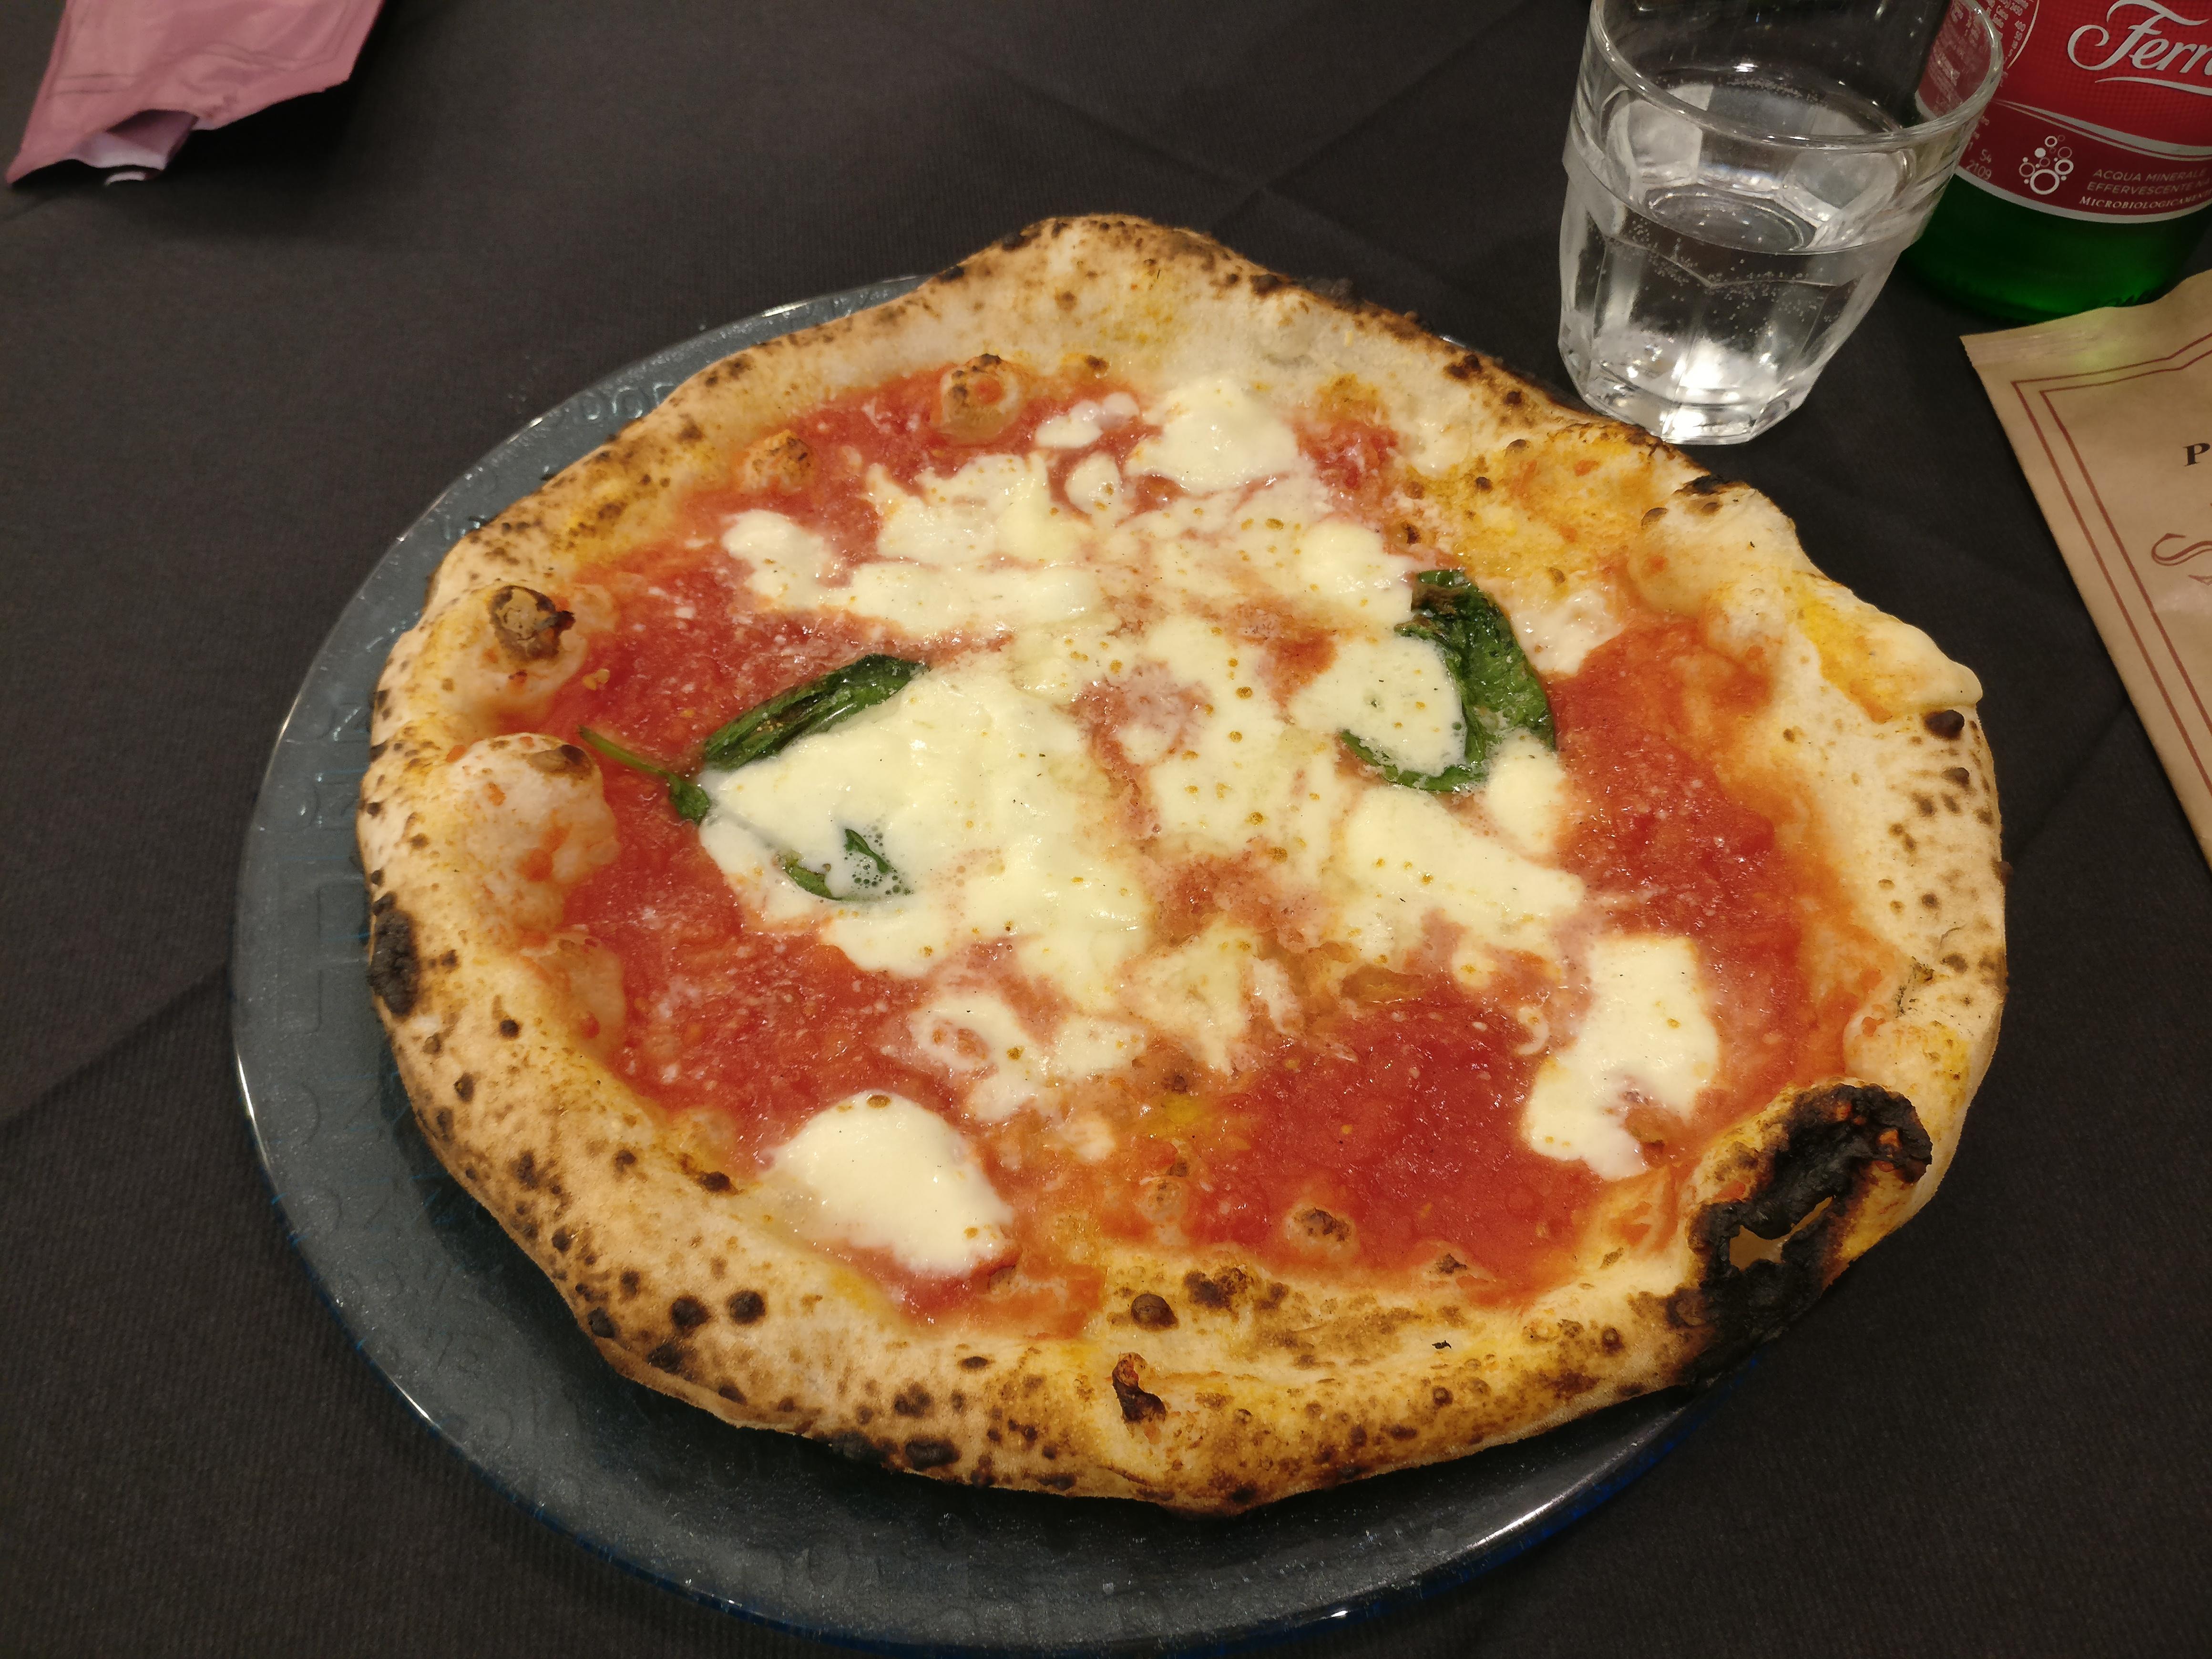 http://foodloader.net/nico_2017-04-23_pizza-margherita-bei-starita-in-materdei.jpg